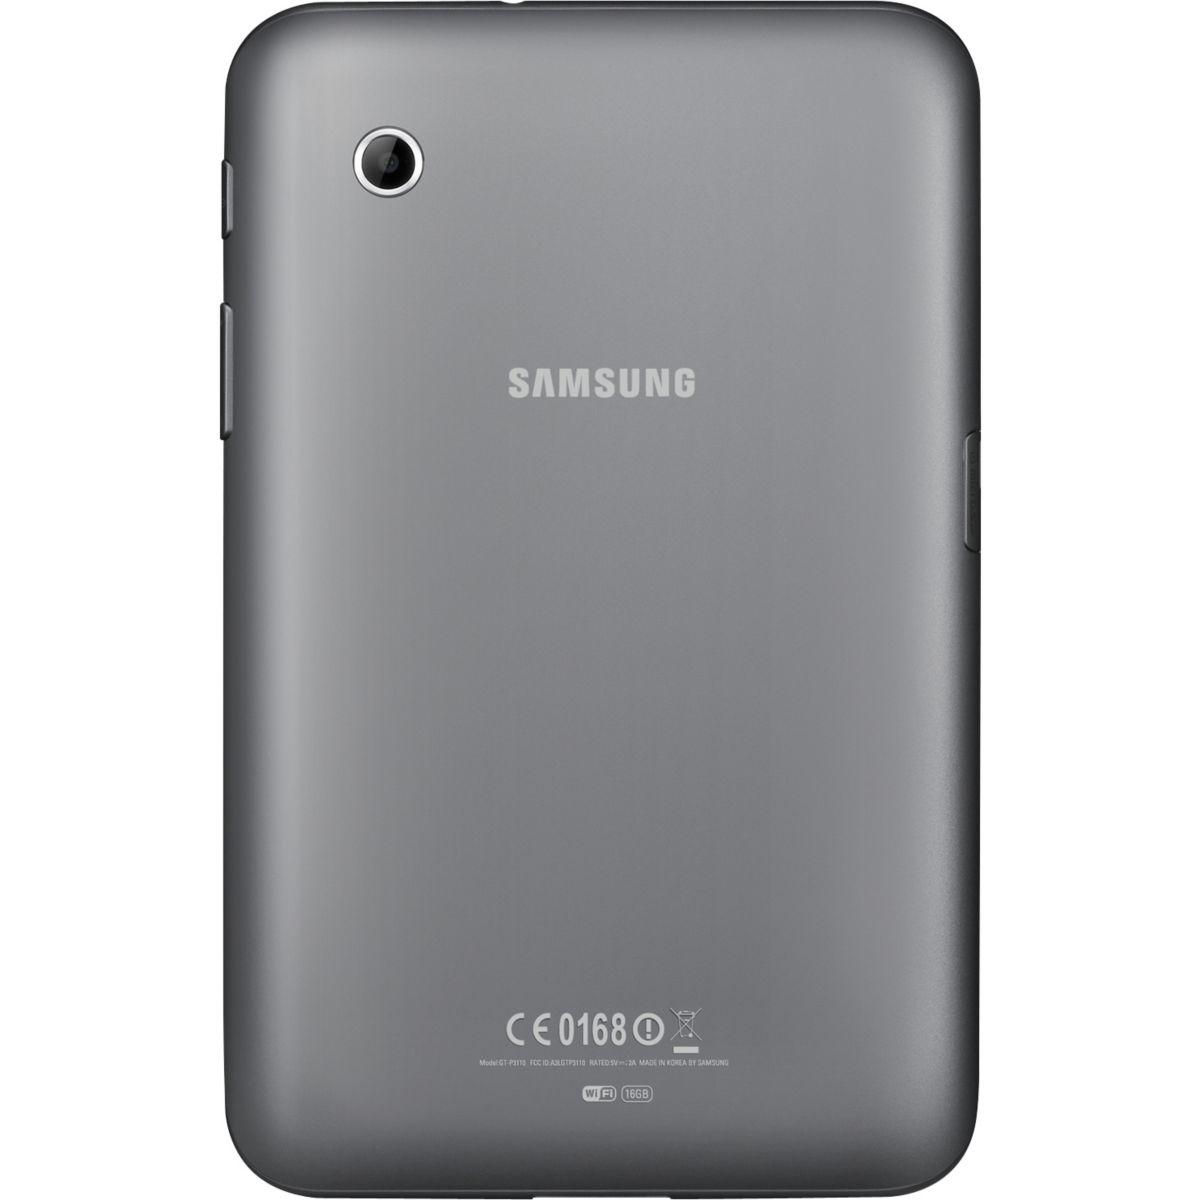 samsung galaxy tab 2 7 8 go tablette tactile sur android comparer avec. Black Bedroom Furniture Sets. Home Design Ideas